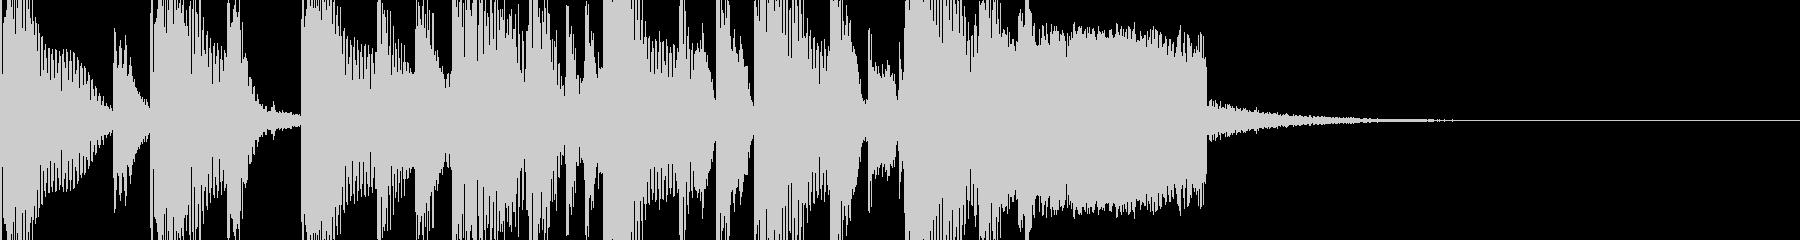 EDMなファンファーレ(ドラムのみ)の未再生の波形